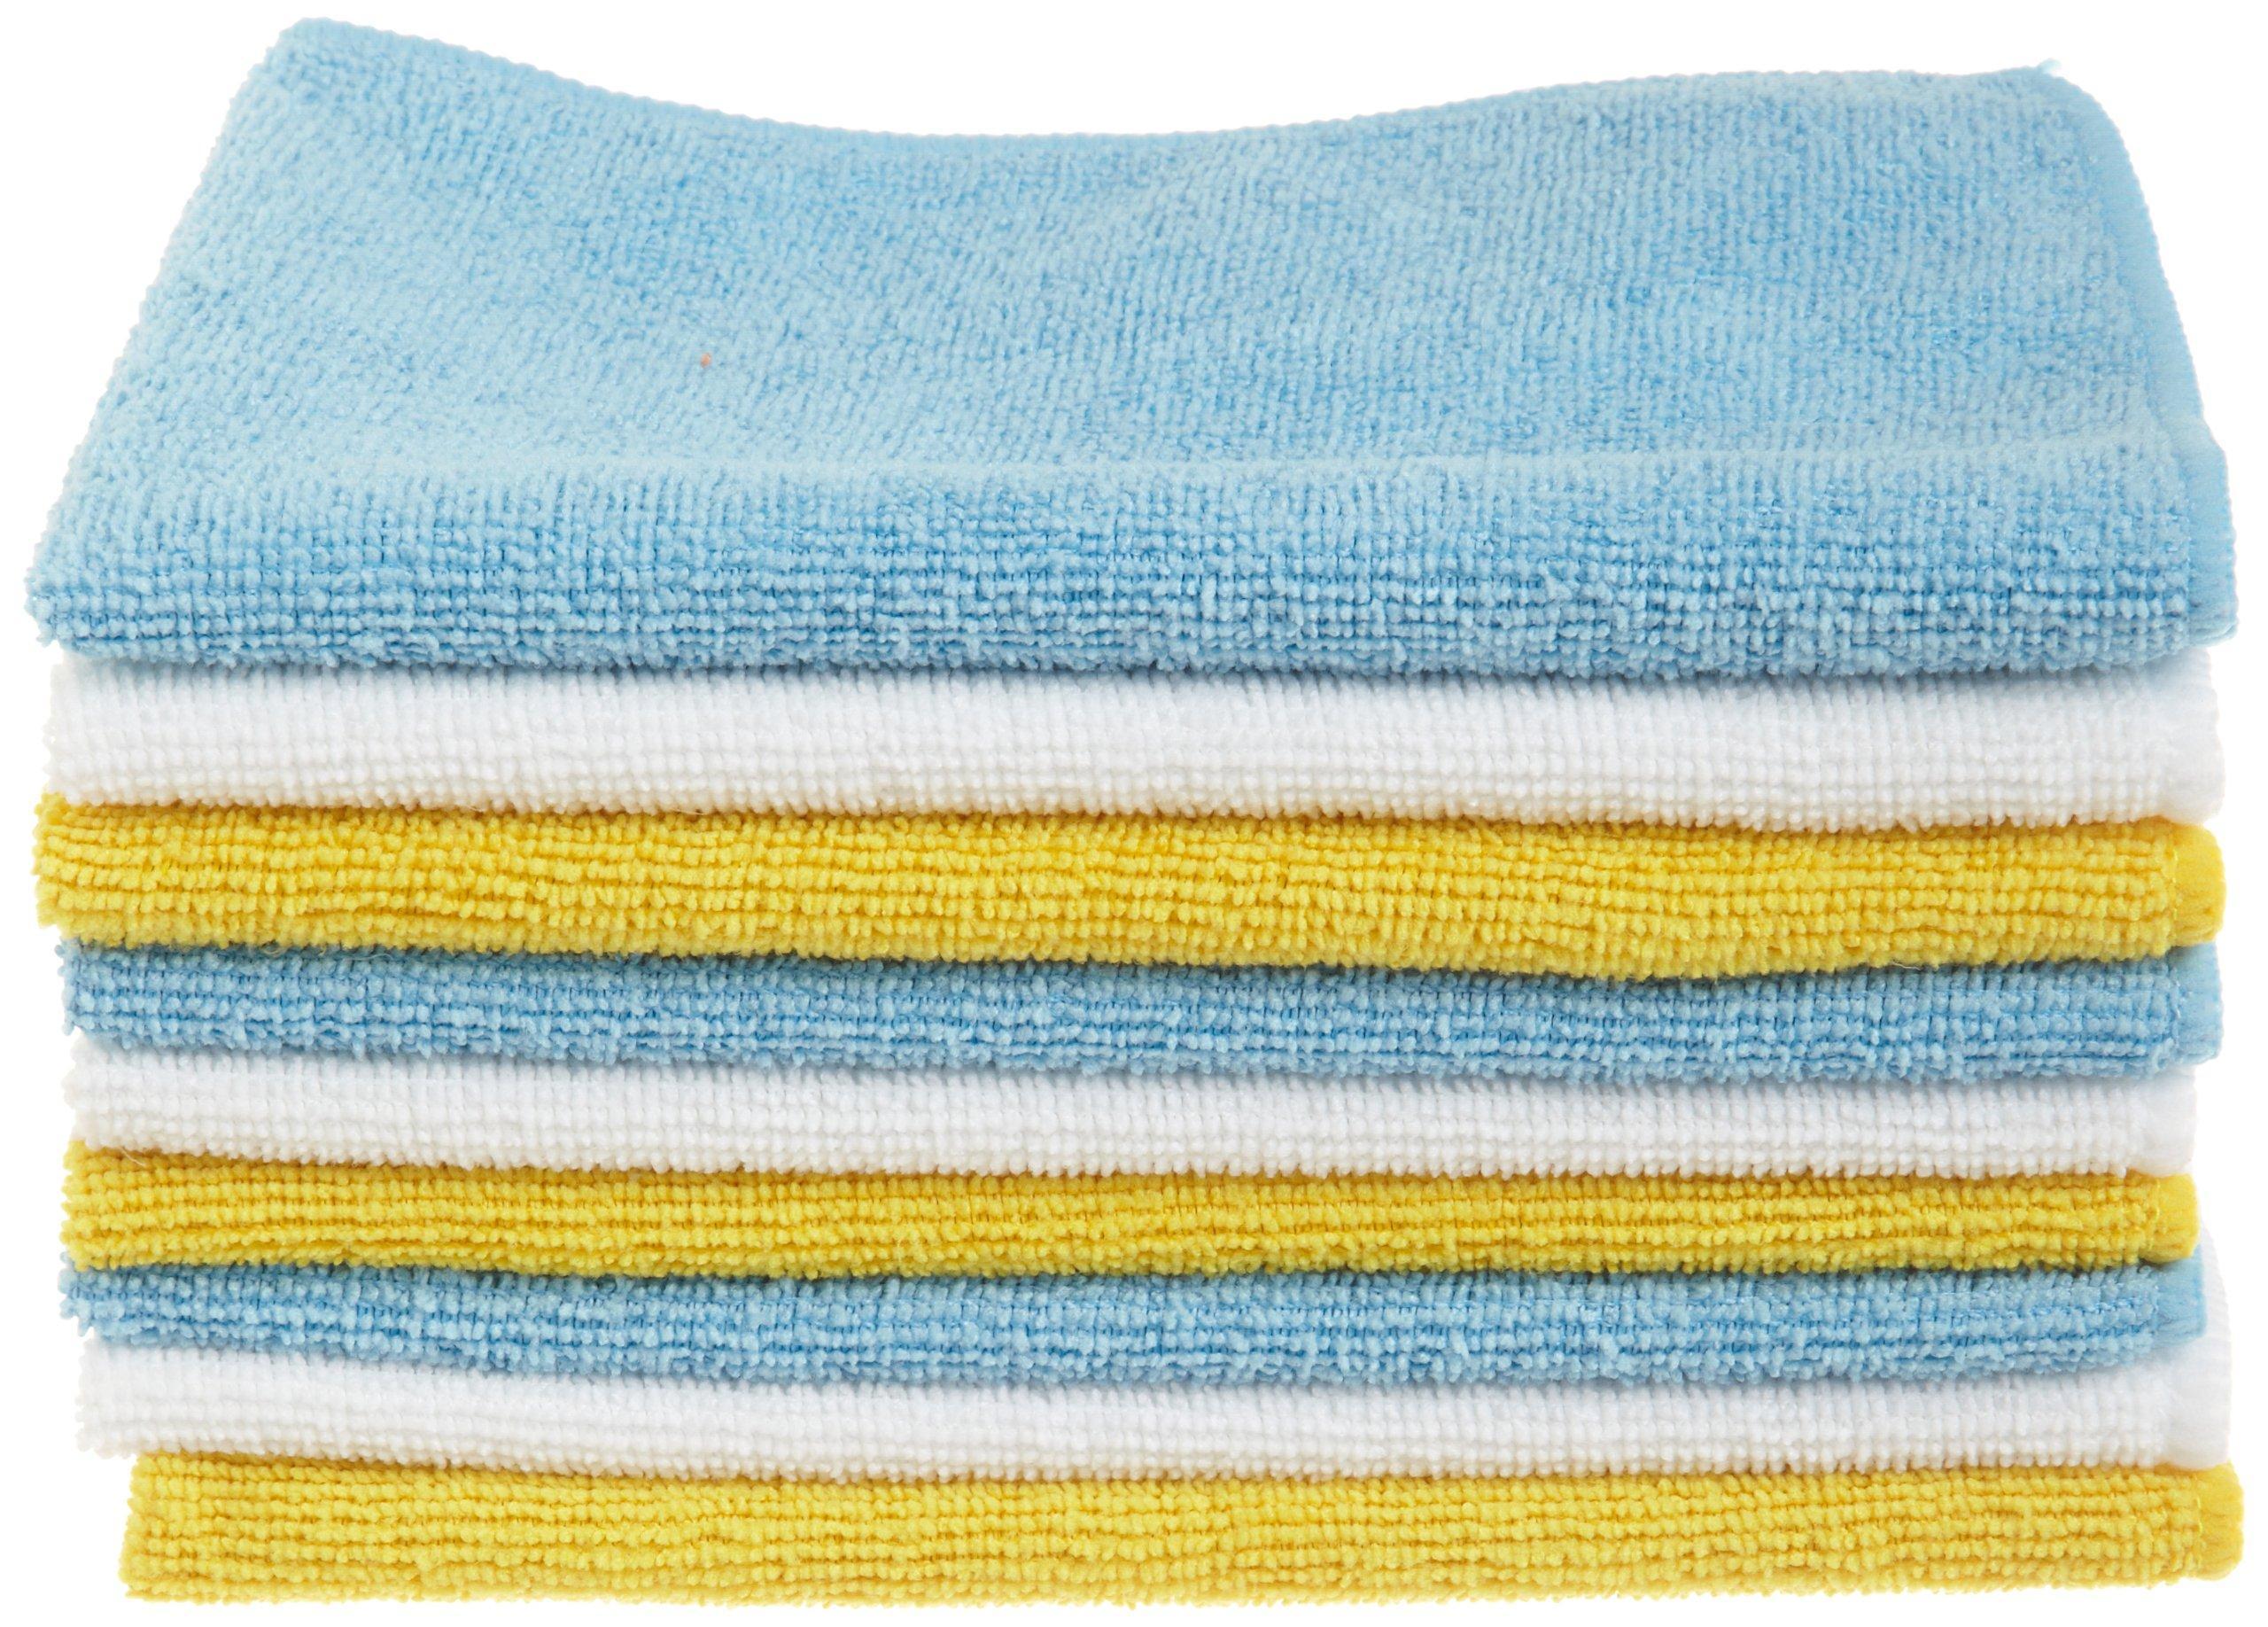 AmazonBasics Microfiber Cleaning Cloth - 36 Pack, Microfiber ...